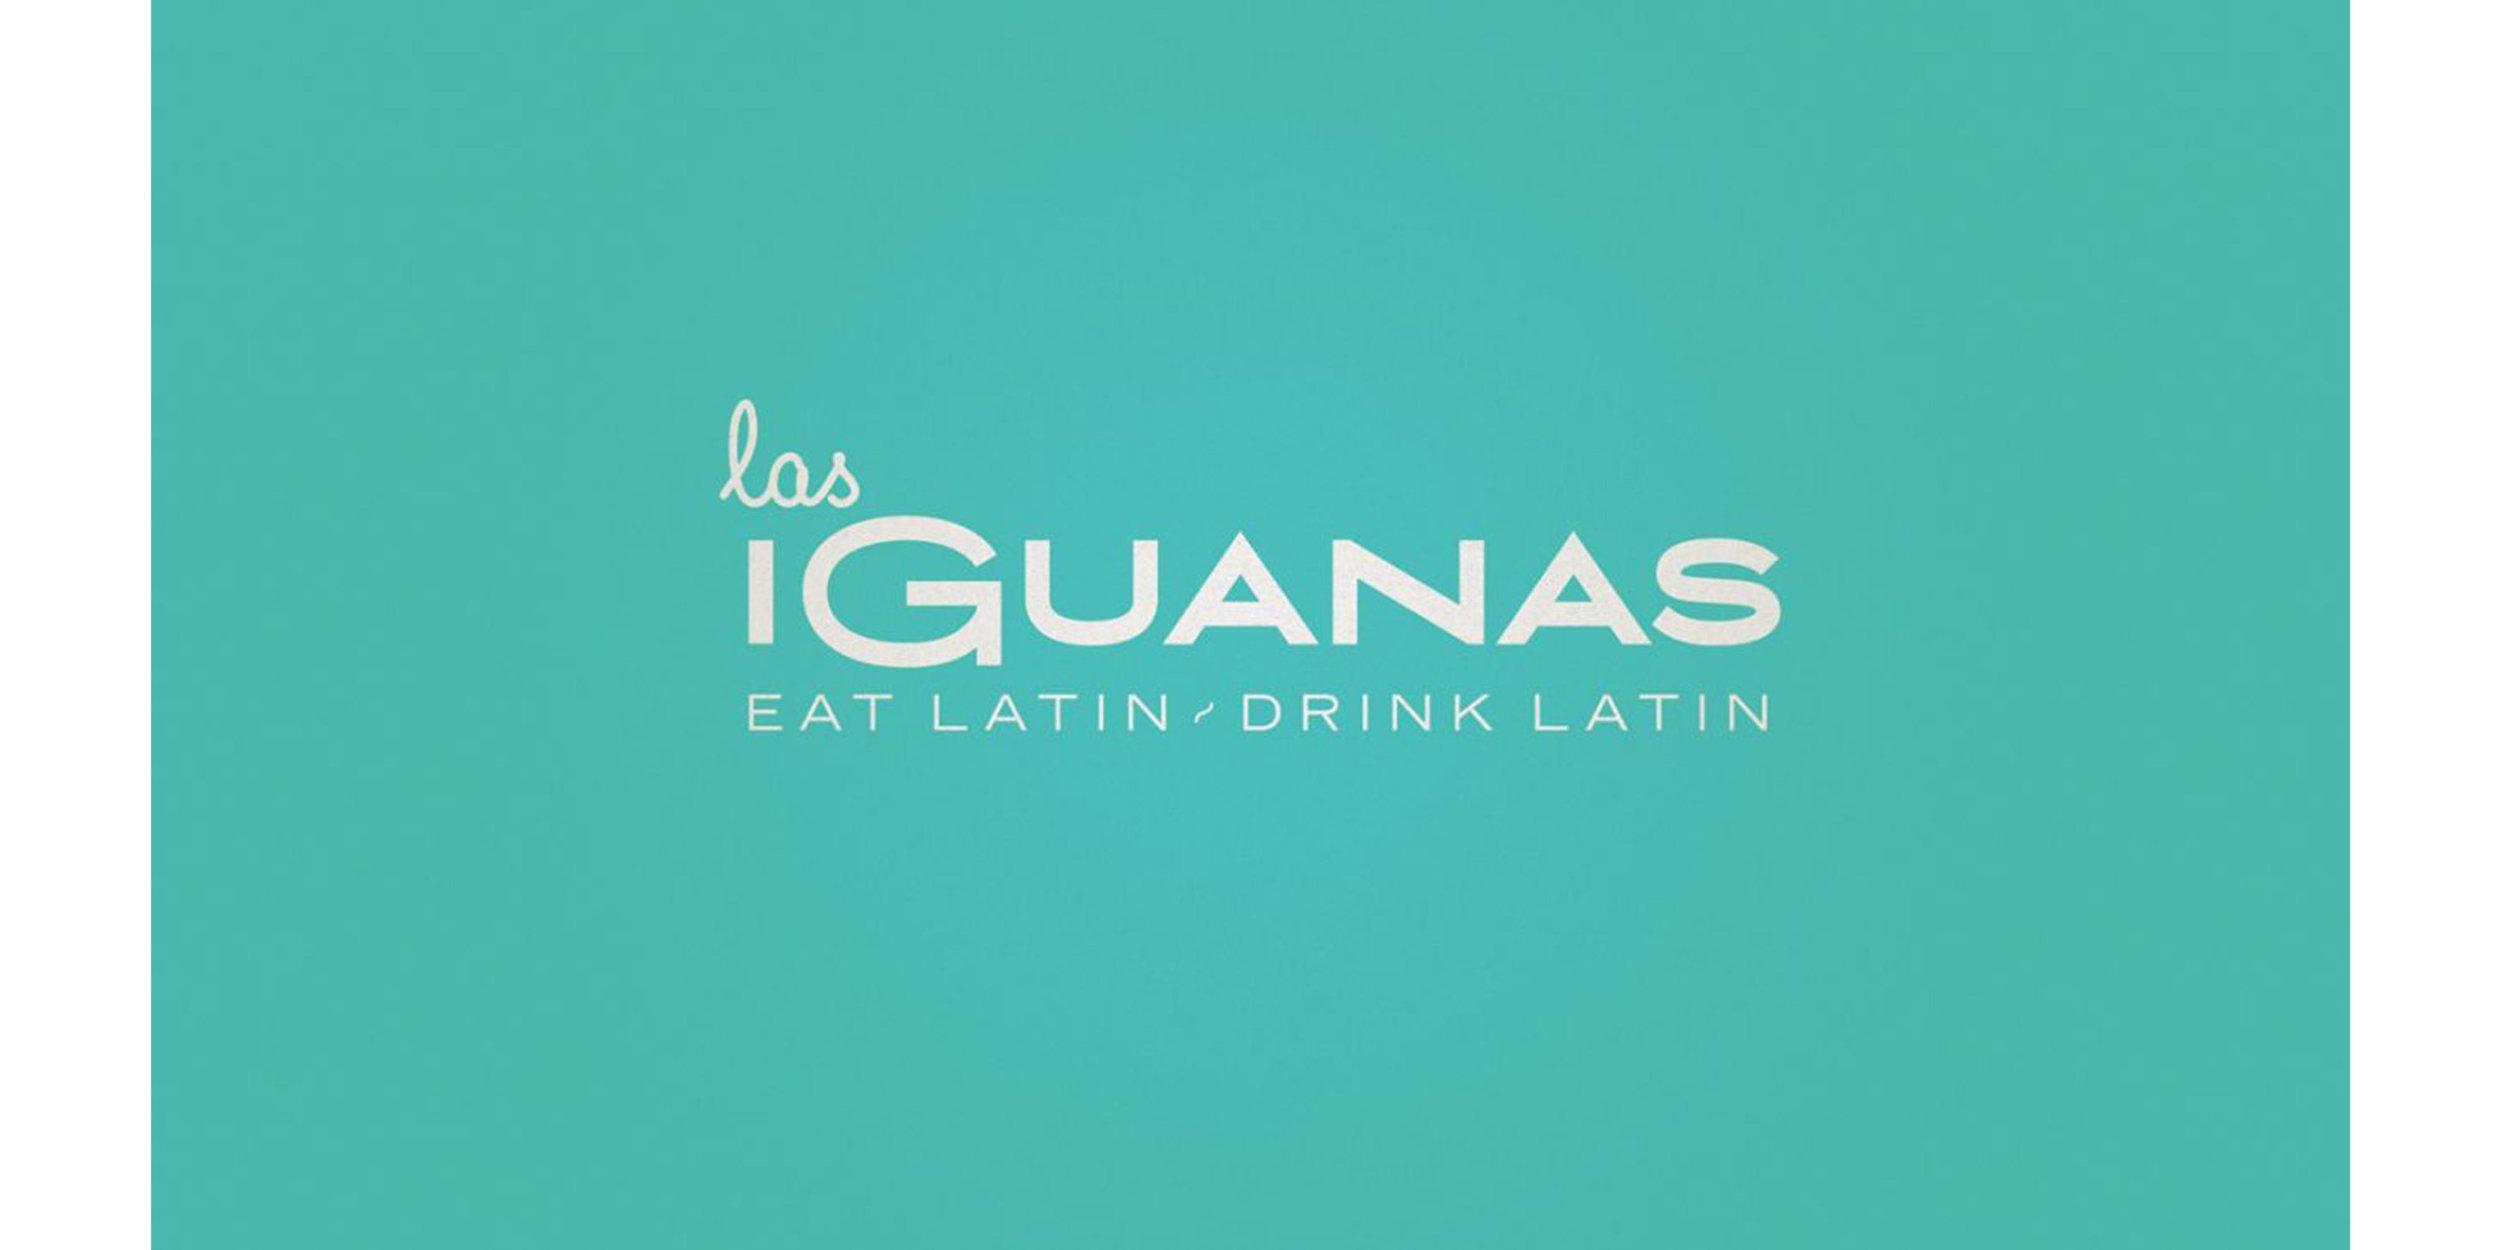 las_iguanas 400x200_smaller.jpg